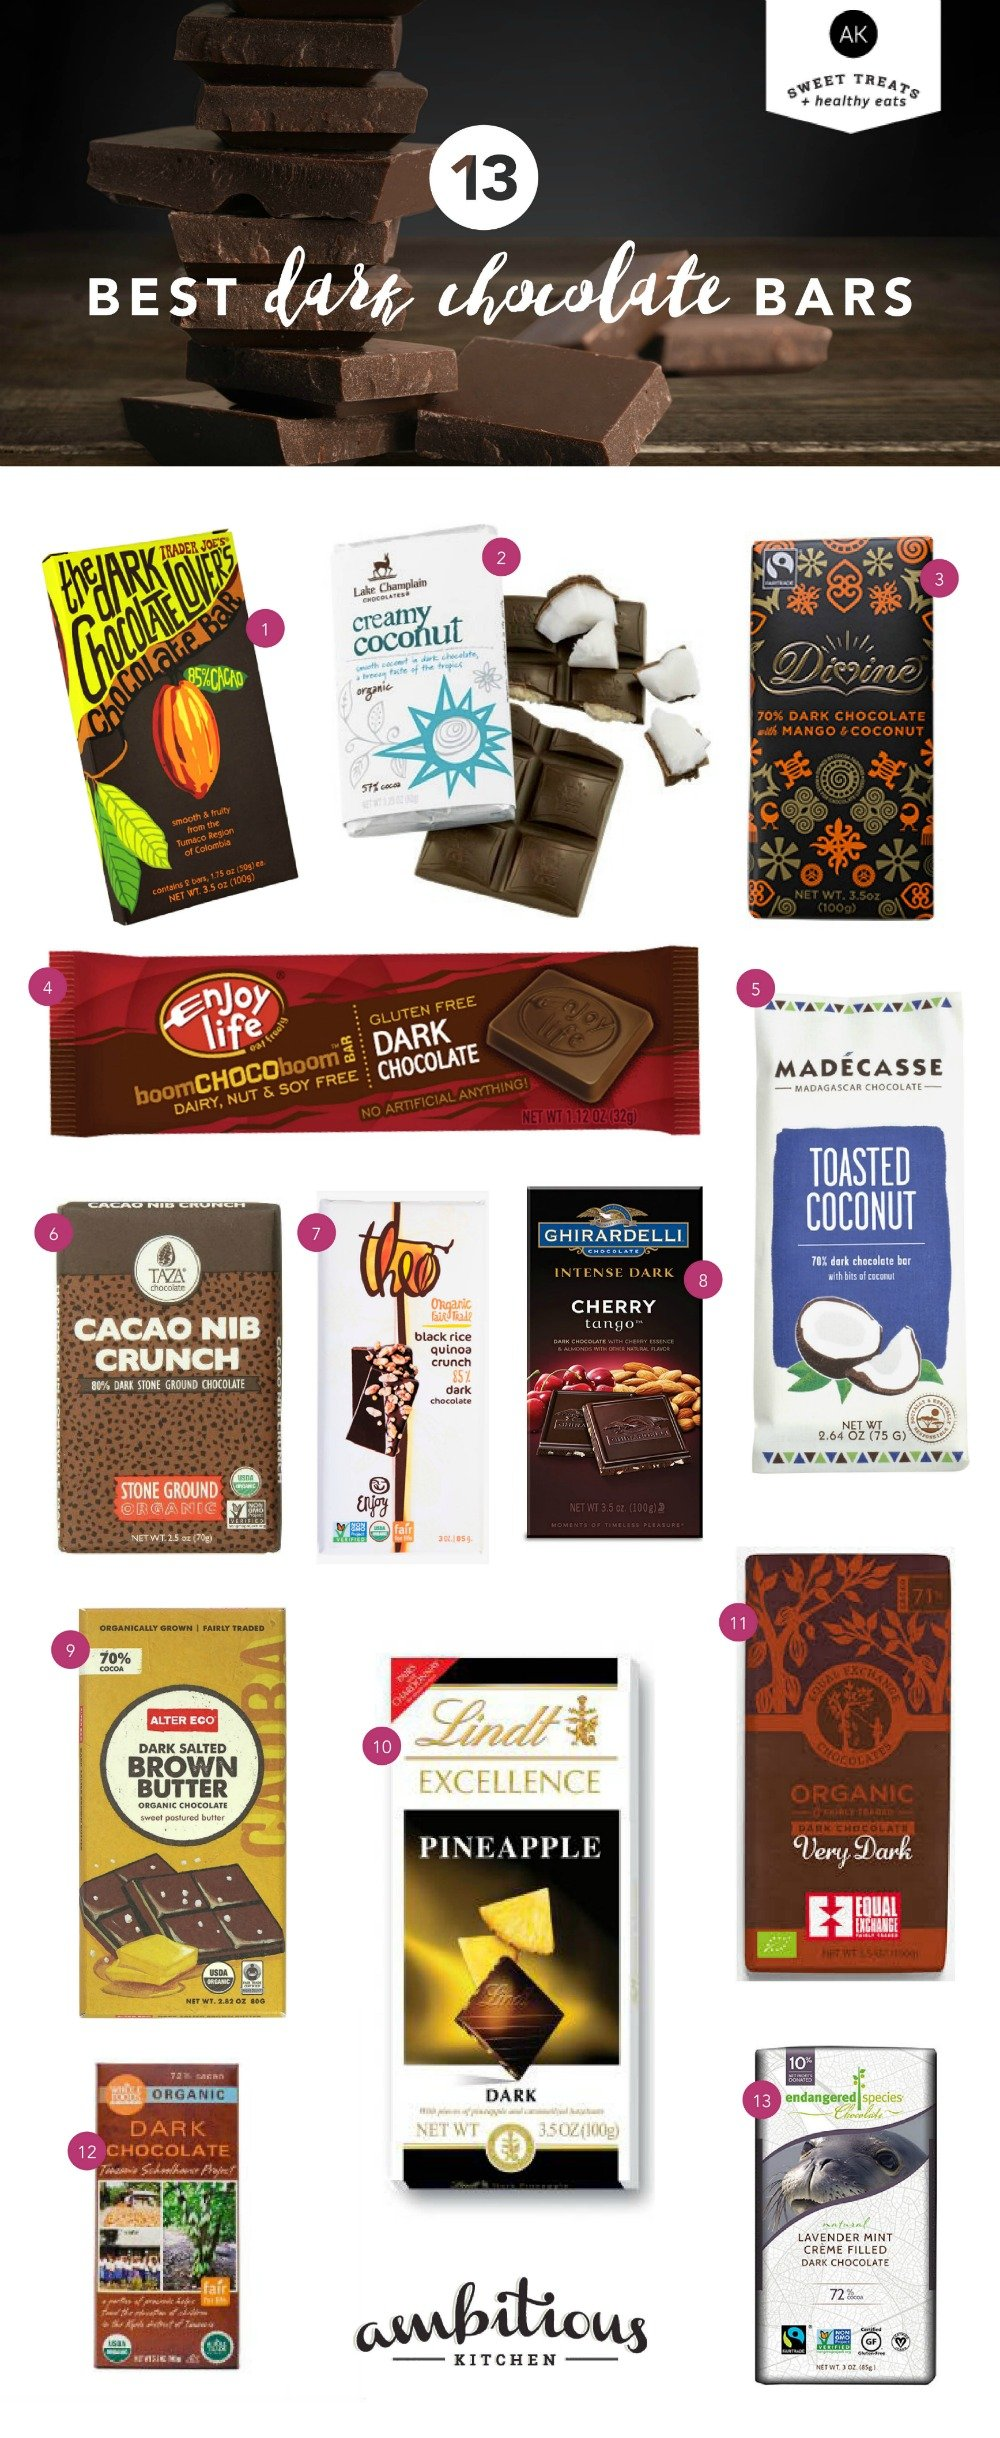 13 of the Best Dark Chocolate Bars + the health benefits of chocolate | ambitiouskitchen.com